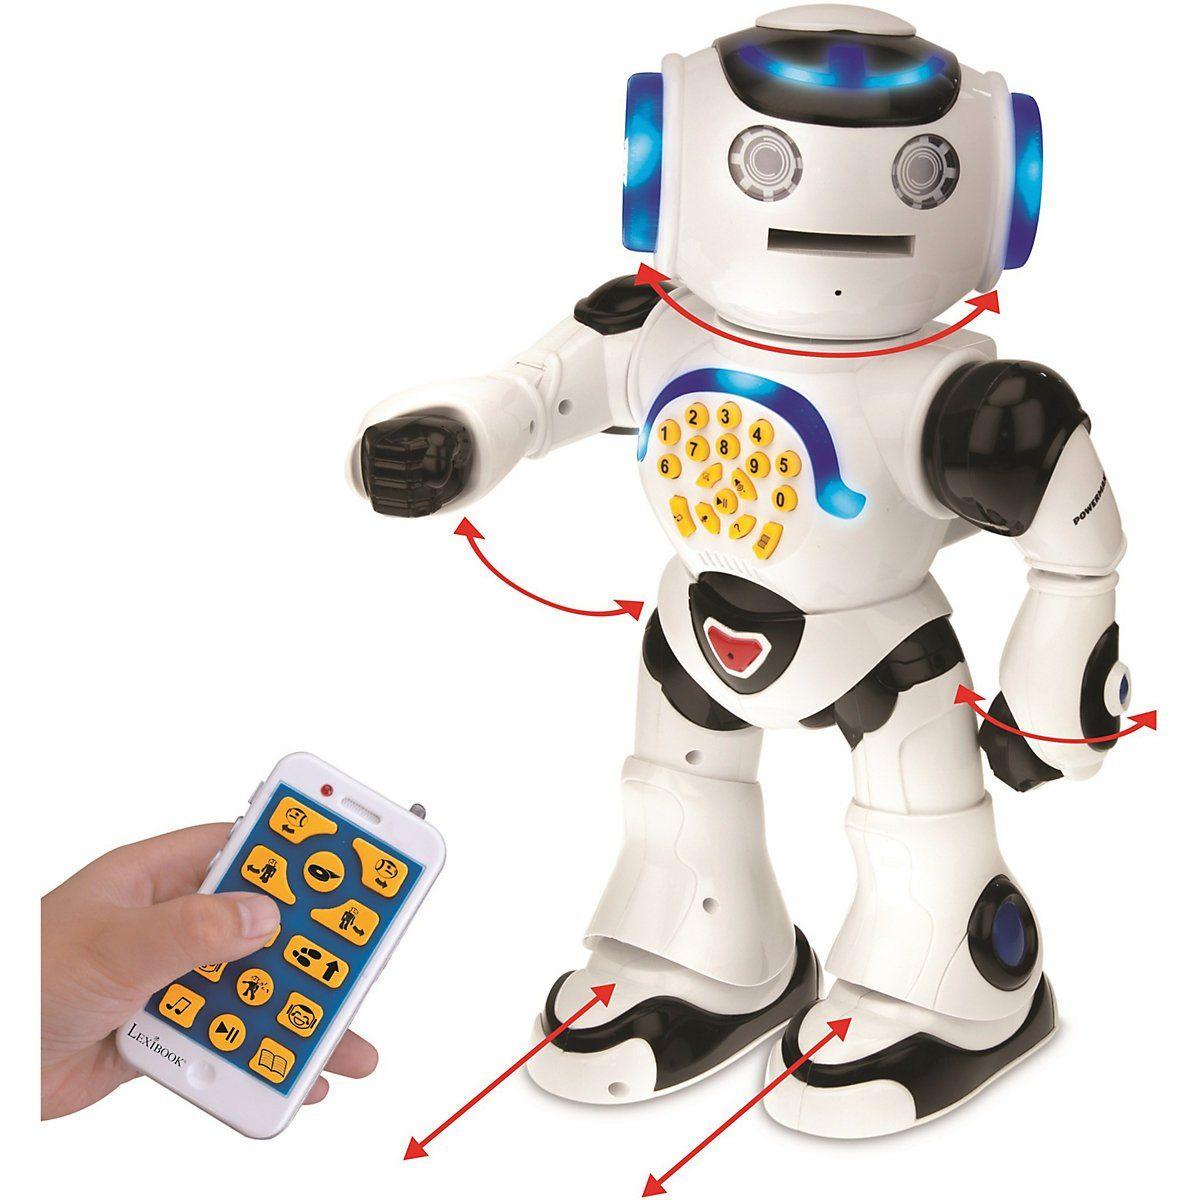 Lexibook Powerman Lern-Roboter